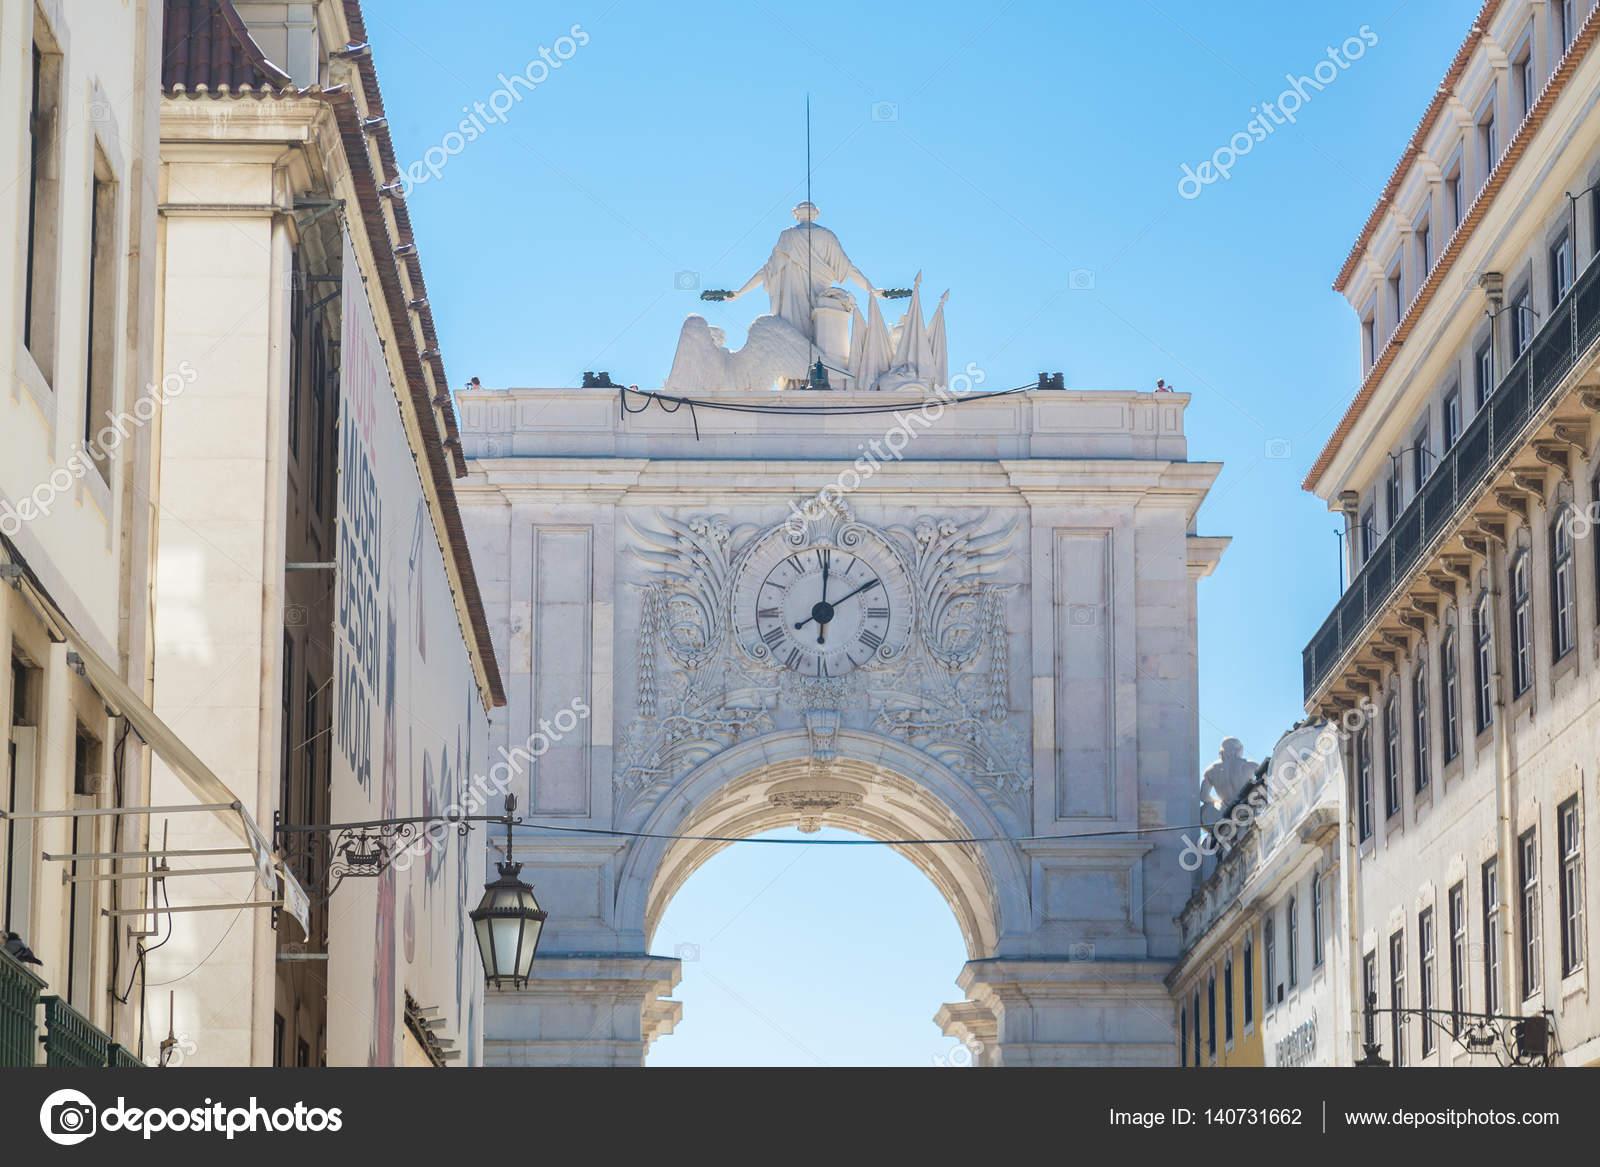 — Dbvirago140731662 Arco De Stock Lisboa © En Foto Reloj qpGMSzjLUV